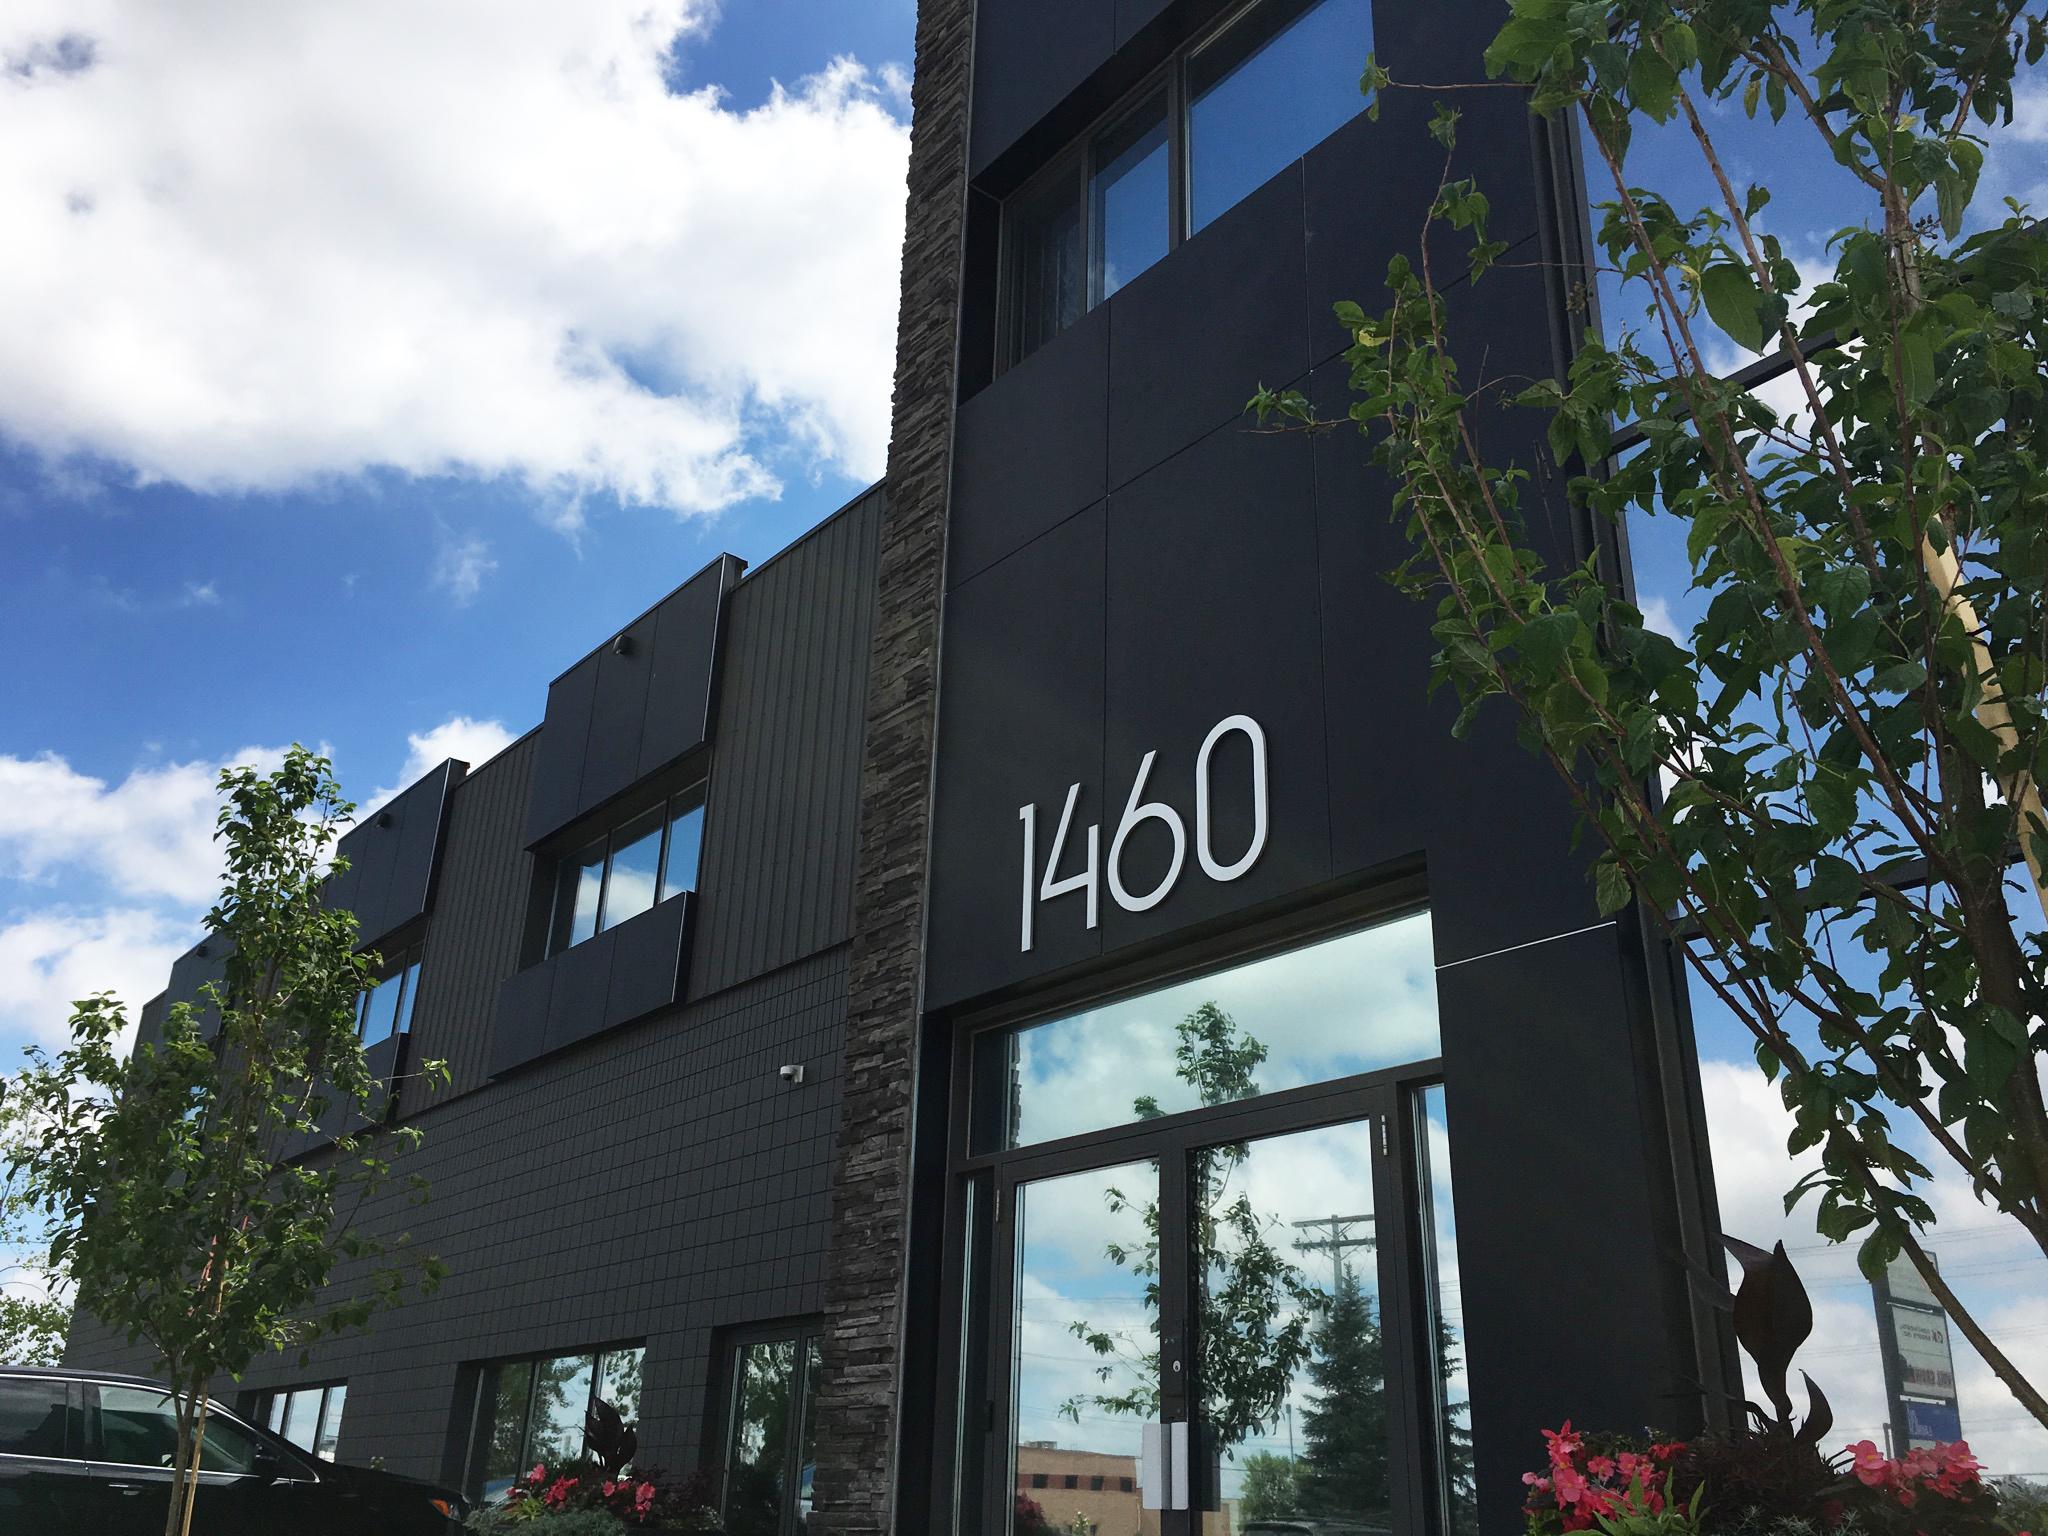 Launch 1460 Winnipeg Twirling Umbrellas Marketing Office